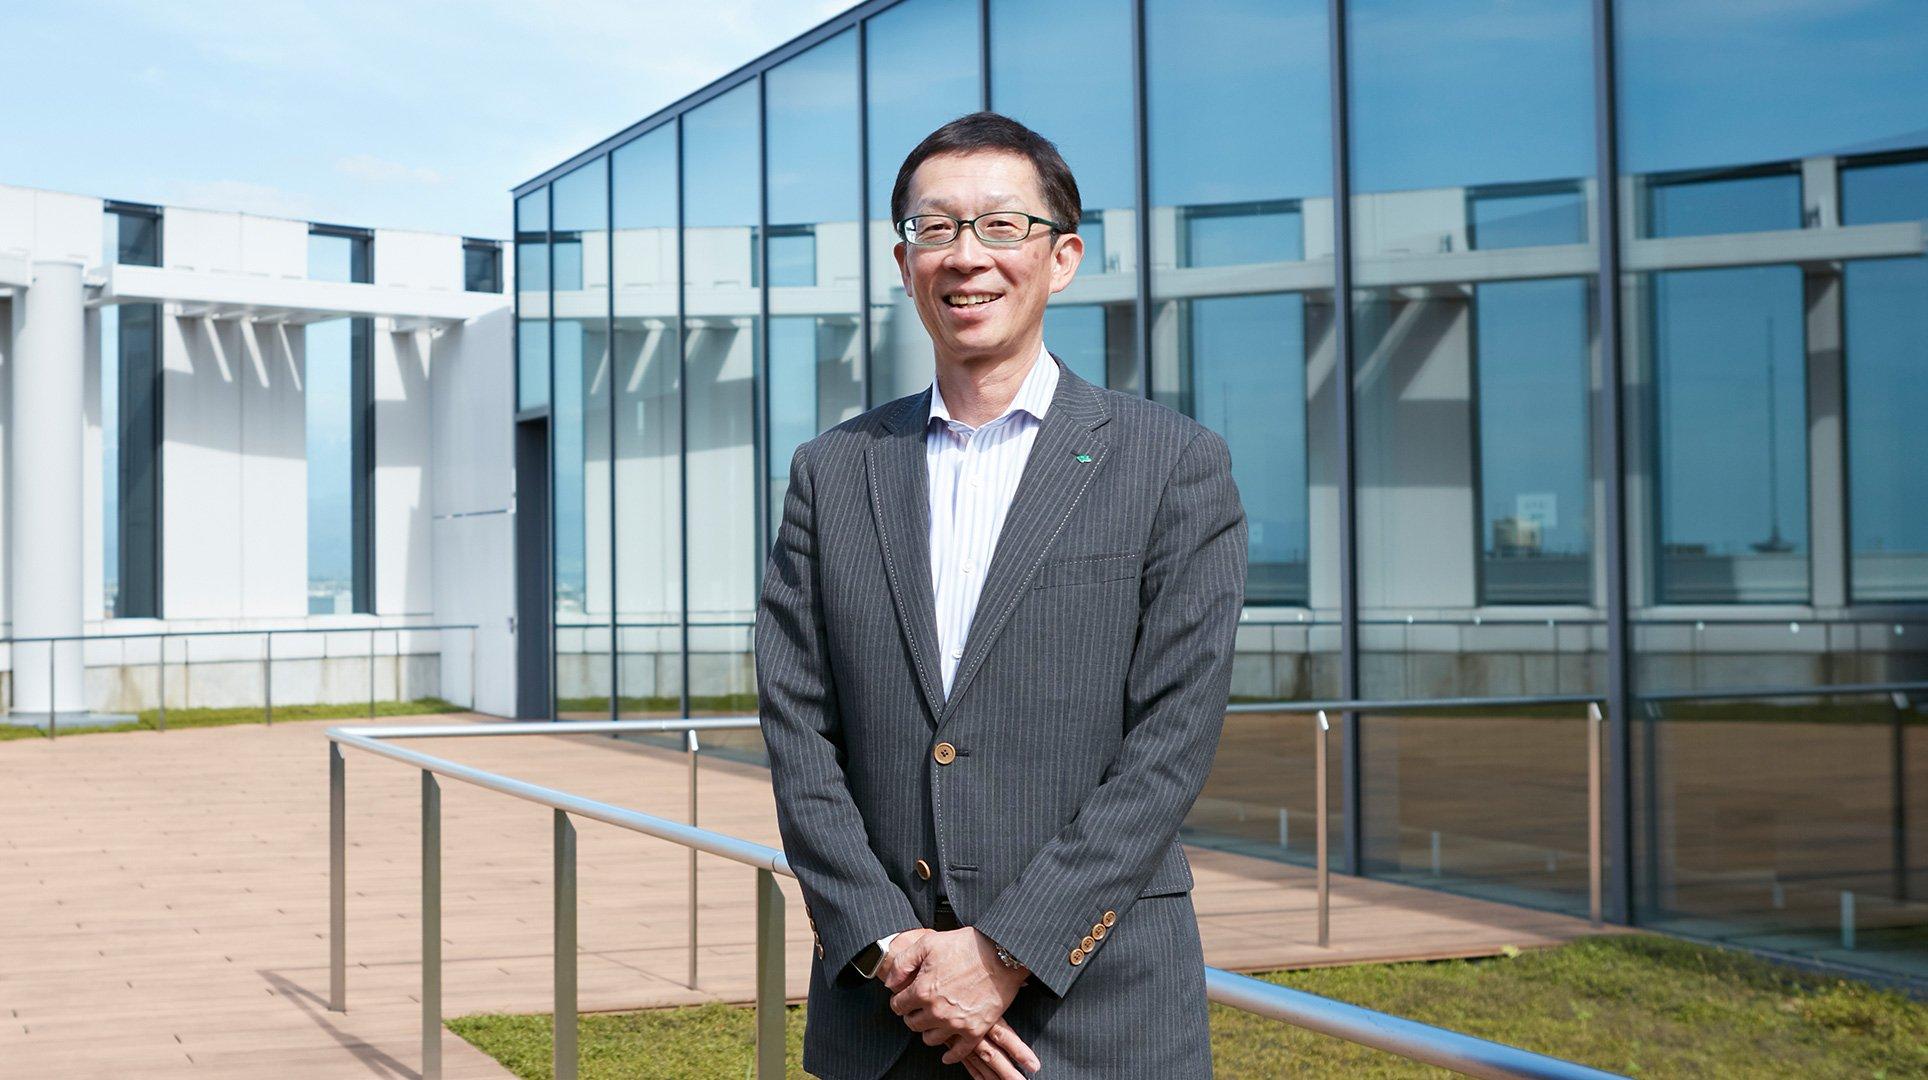 CaseStudy-ToyamaDaiichi-bank-Moneytree-MTLink_D-interview-profile